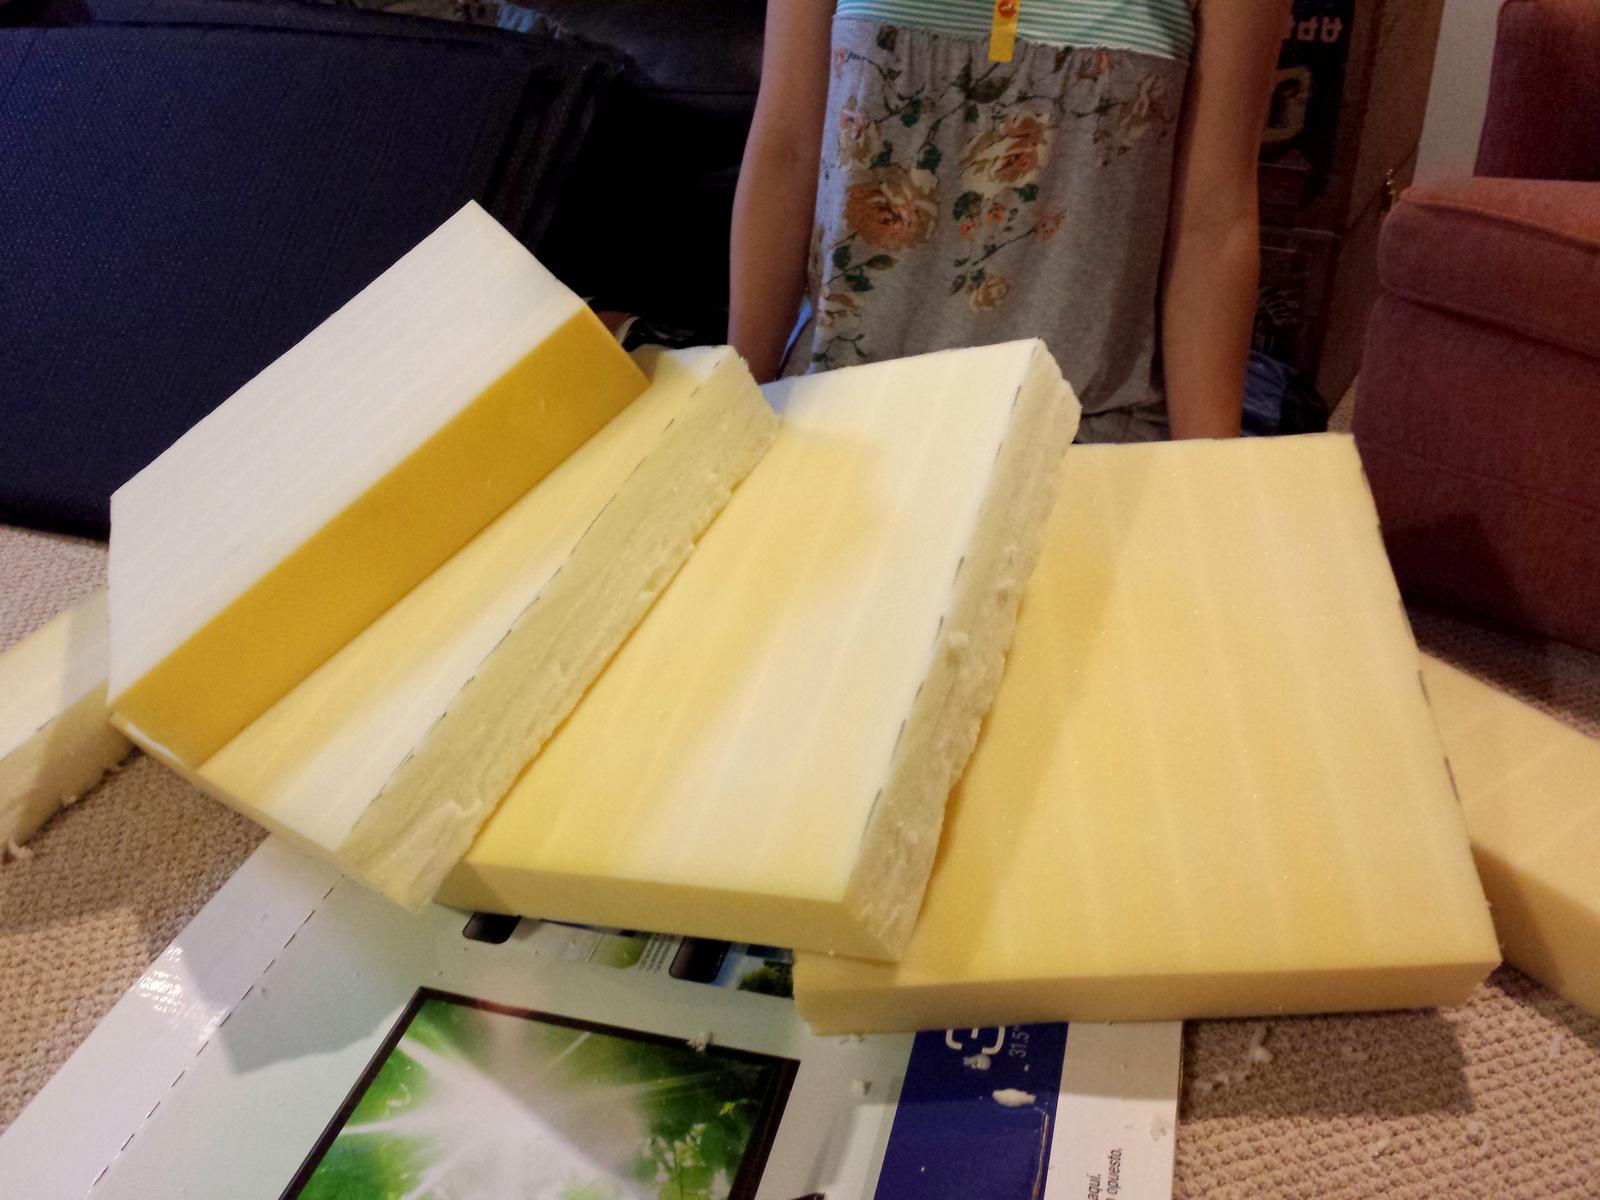 Diy no sew patio seat cushions come along with chong 4 foam cushions solutioingenieria Images